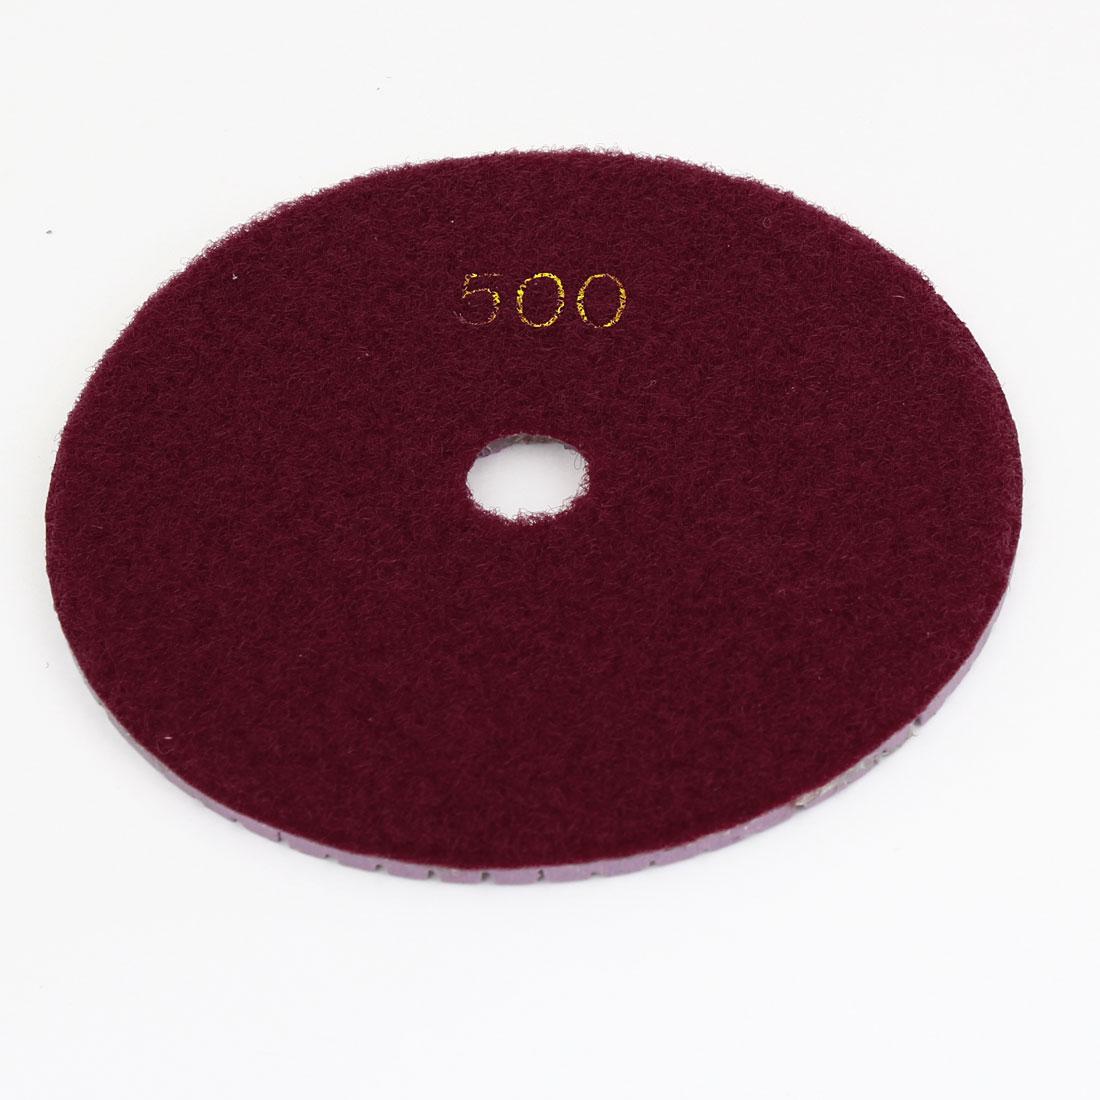 Marble Stone 500 Grit Wet Dry Diamond Buffer Polishing Pad Disc Red